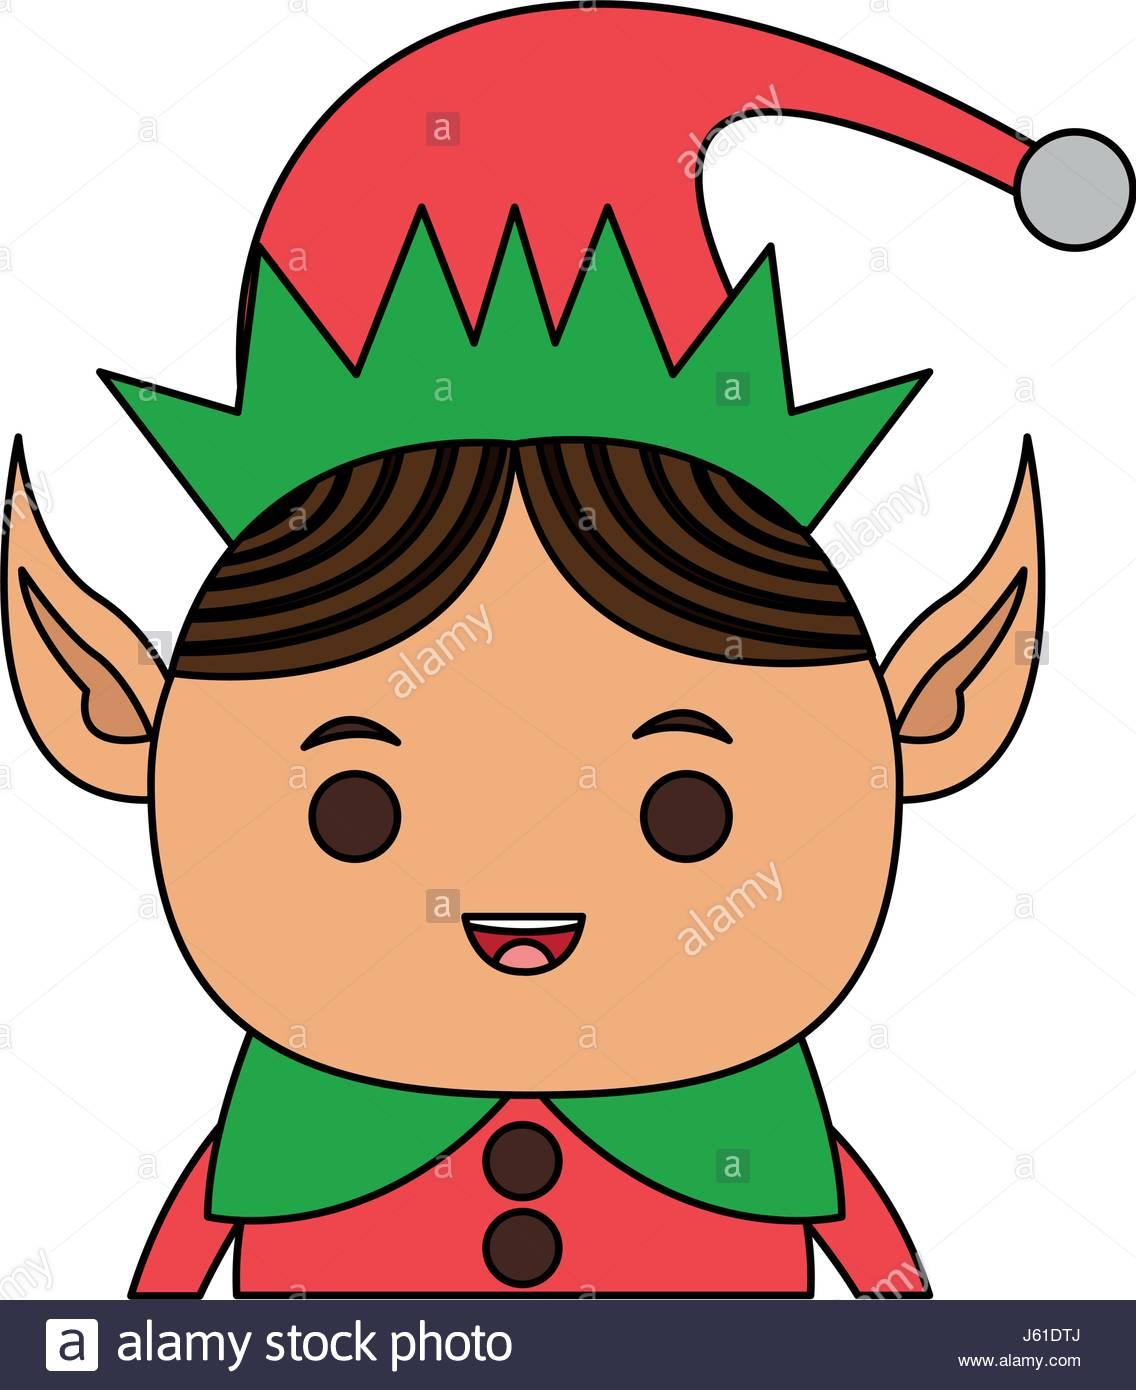 1136x1390 Color Image Cartoon Half Body Christmas Elf With Long Ears Stock